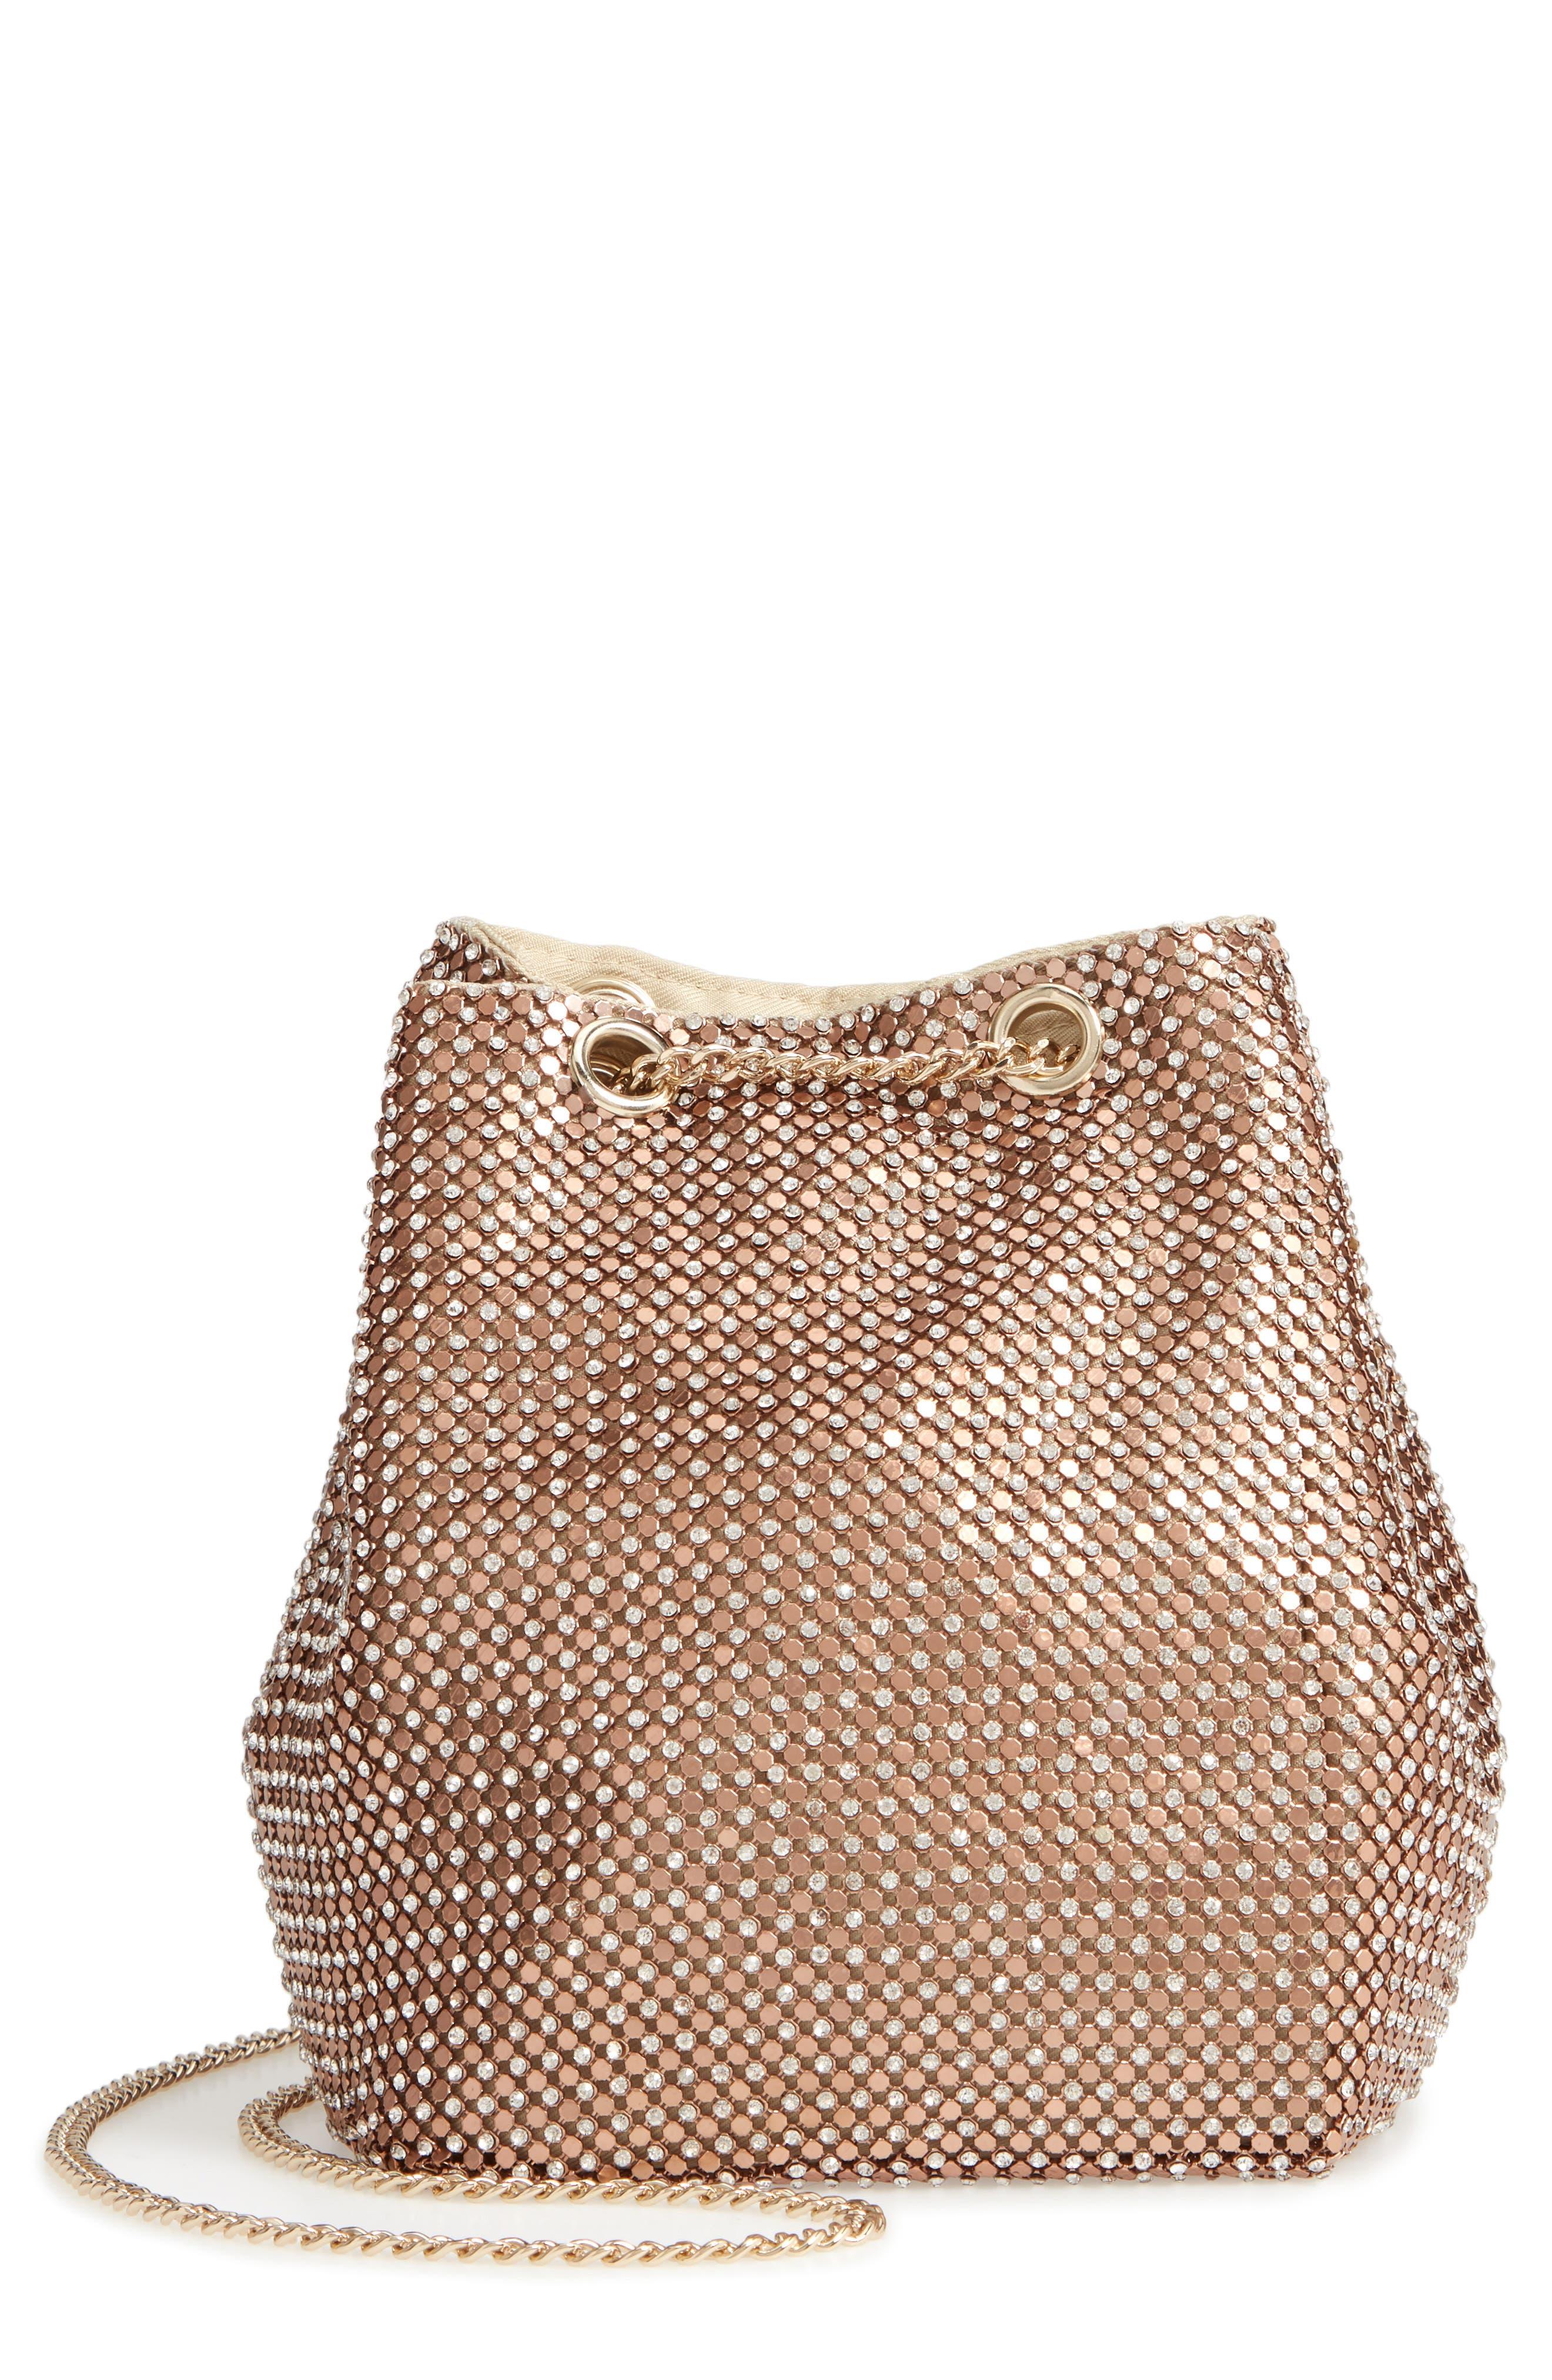 Crystal Mesh Crossbody Bucket Bag,                         Main,                         color, ROSE GOLD